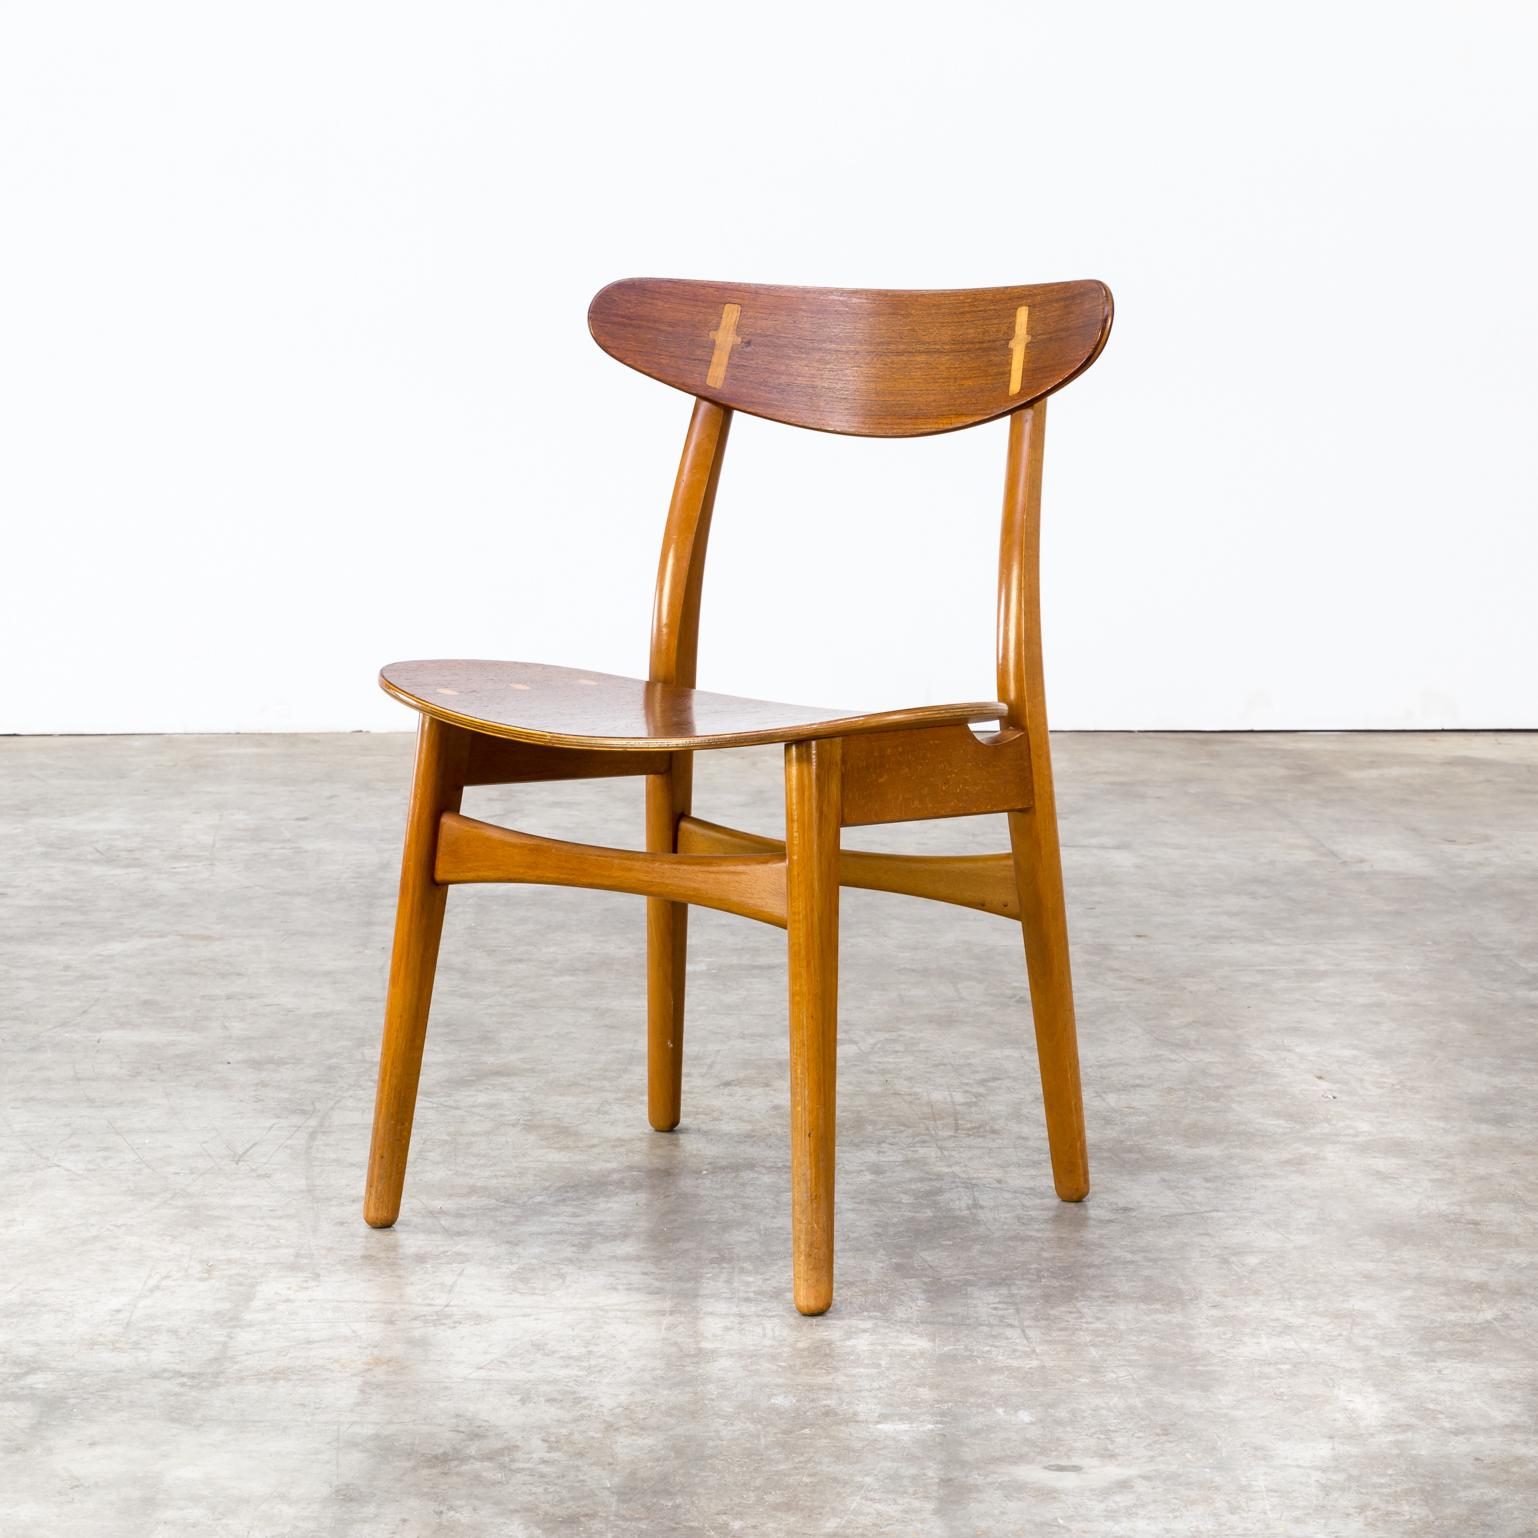 1950s hans wegner dining chairs ch 30 for carl hansen son set 6 barbmama. Black Bedroom Furniture Sets. Home Design Ideas